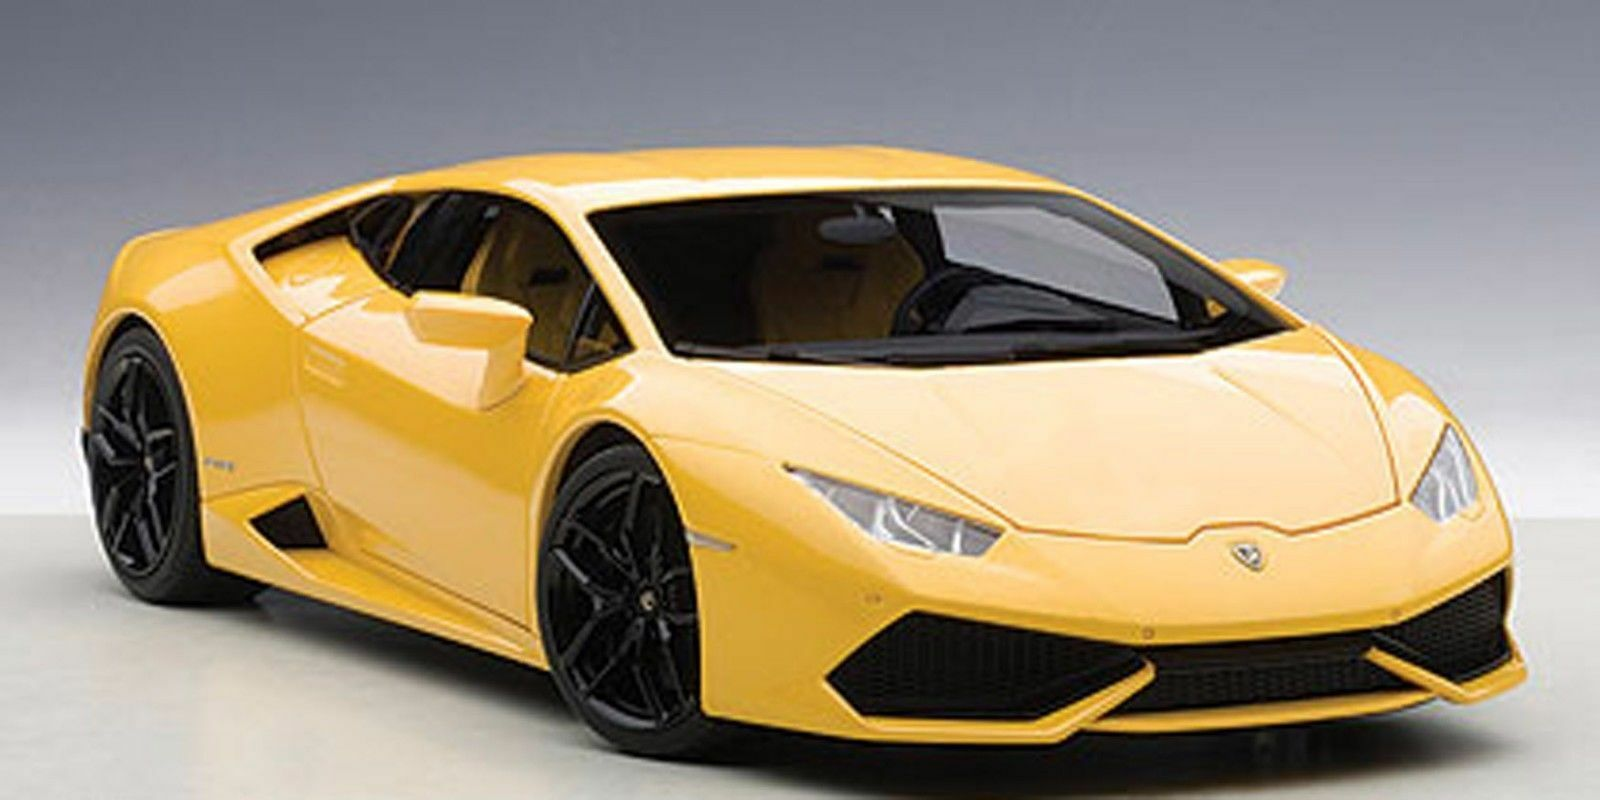 Autoart LAMBORGHINI HURACAN LP610-4 yellow MIDAS PEARL EFFECT YELLOW 1 18New